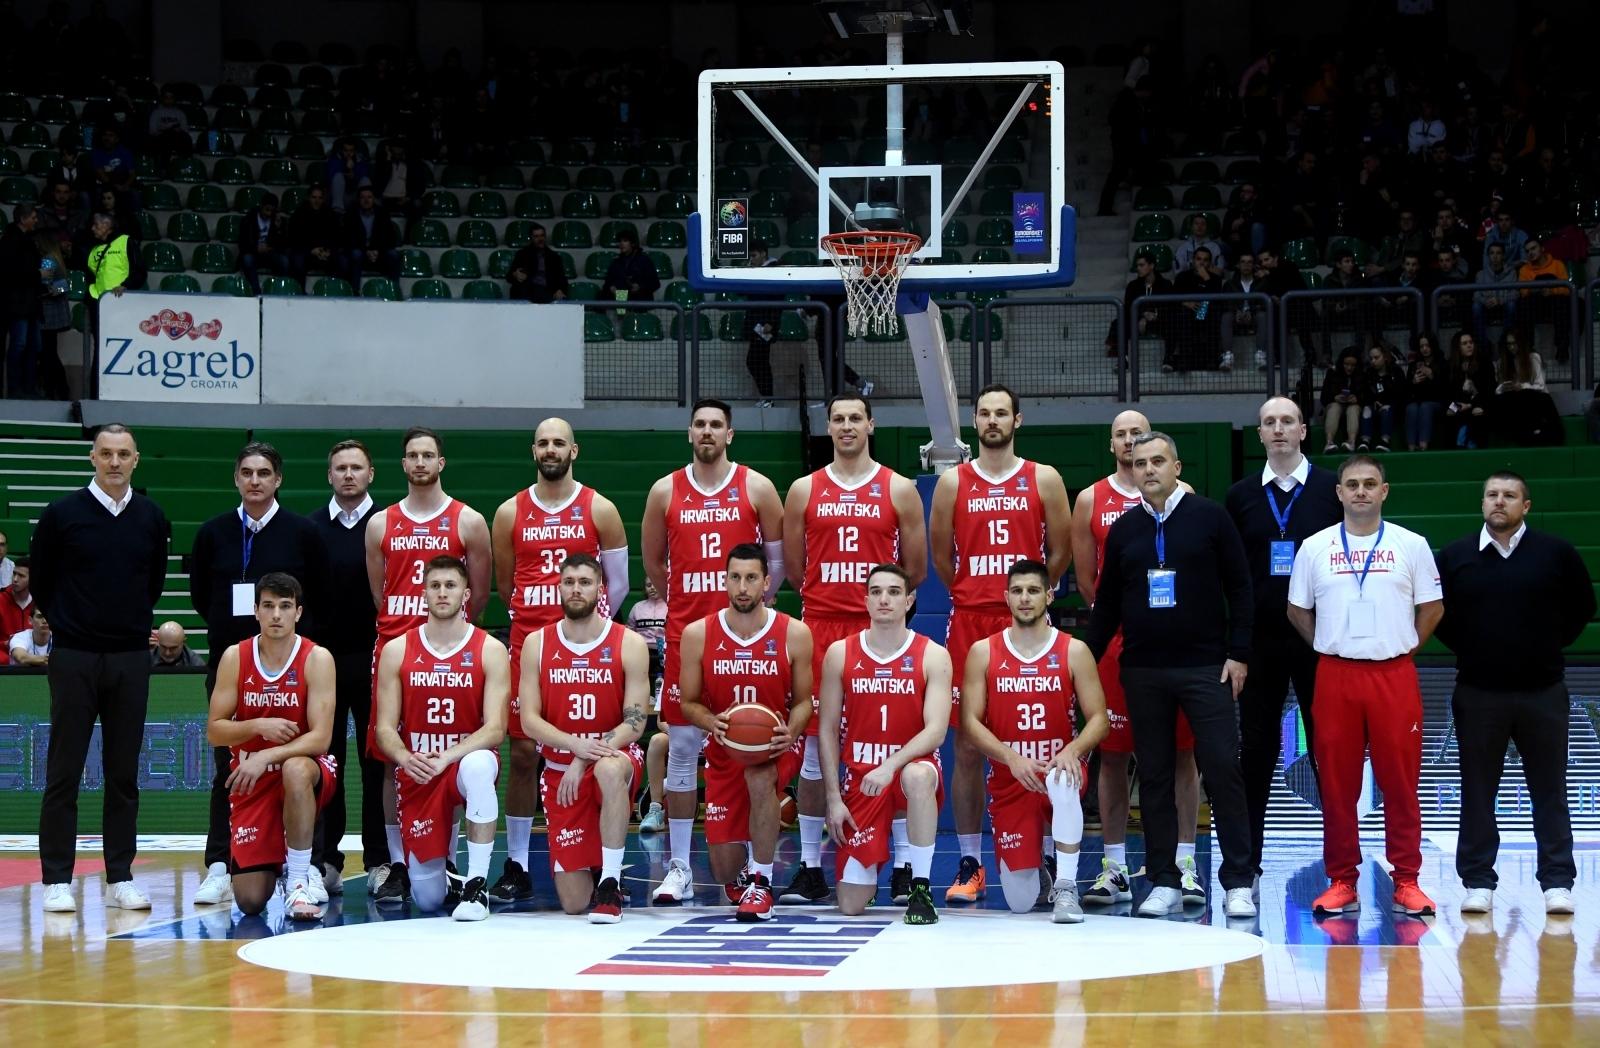 Hrvatski košarkaši slavili na startu kvalifikacija za Europsko prvenstvo